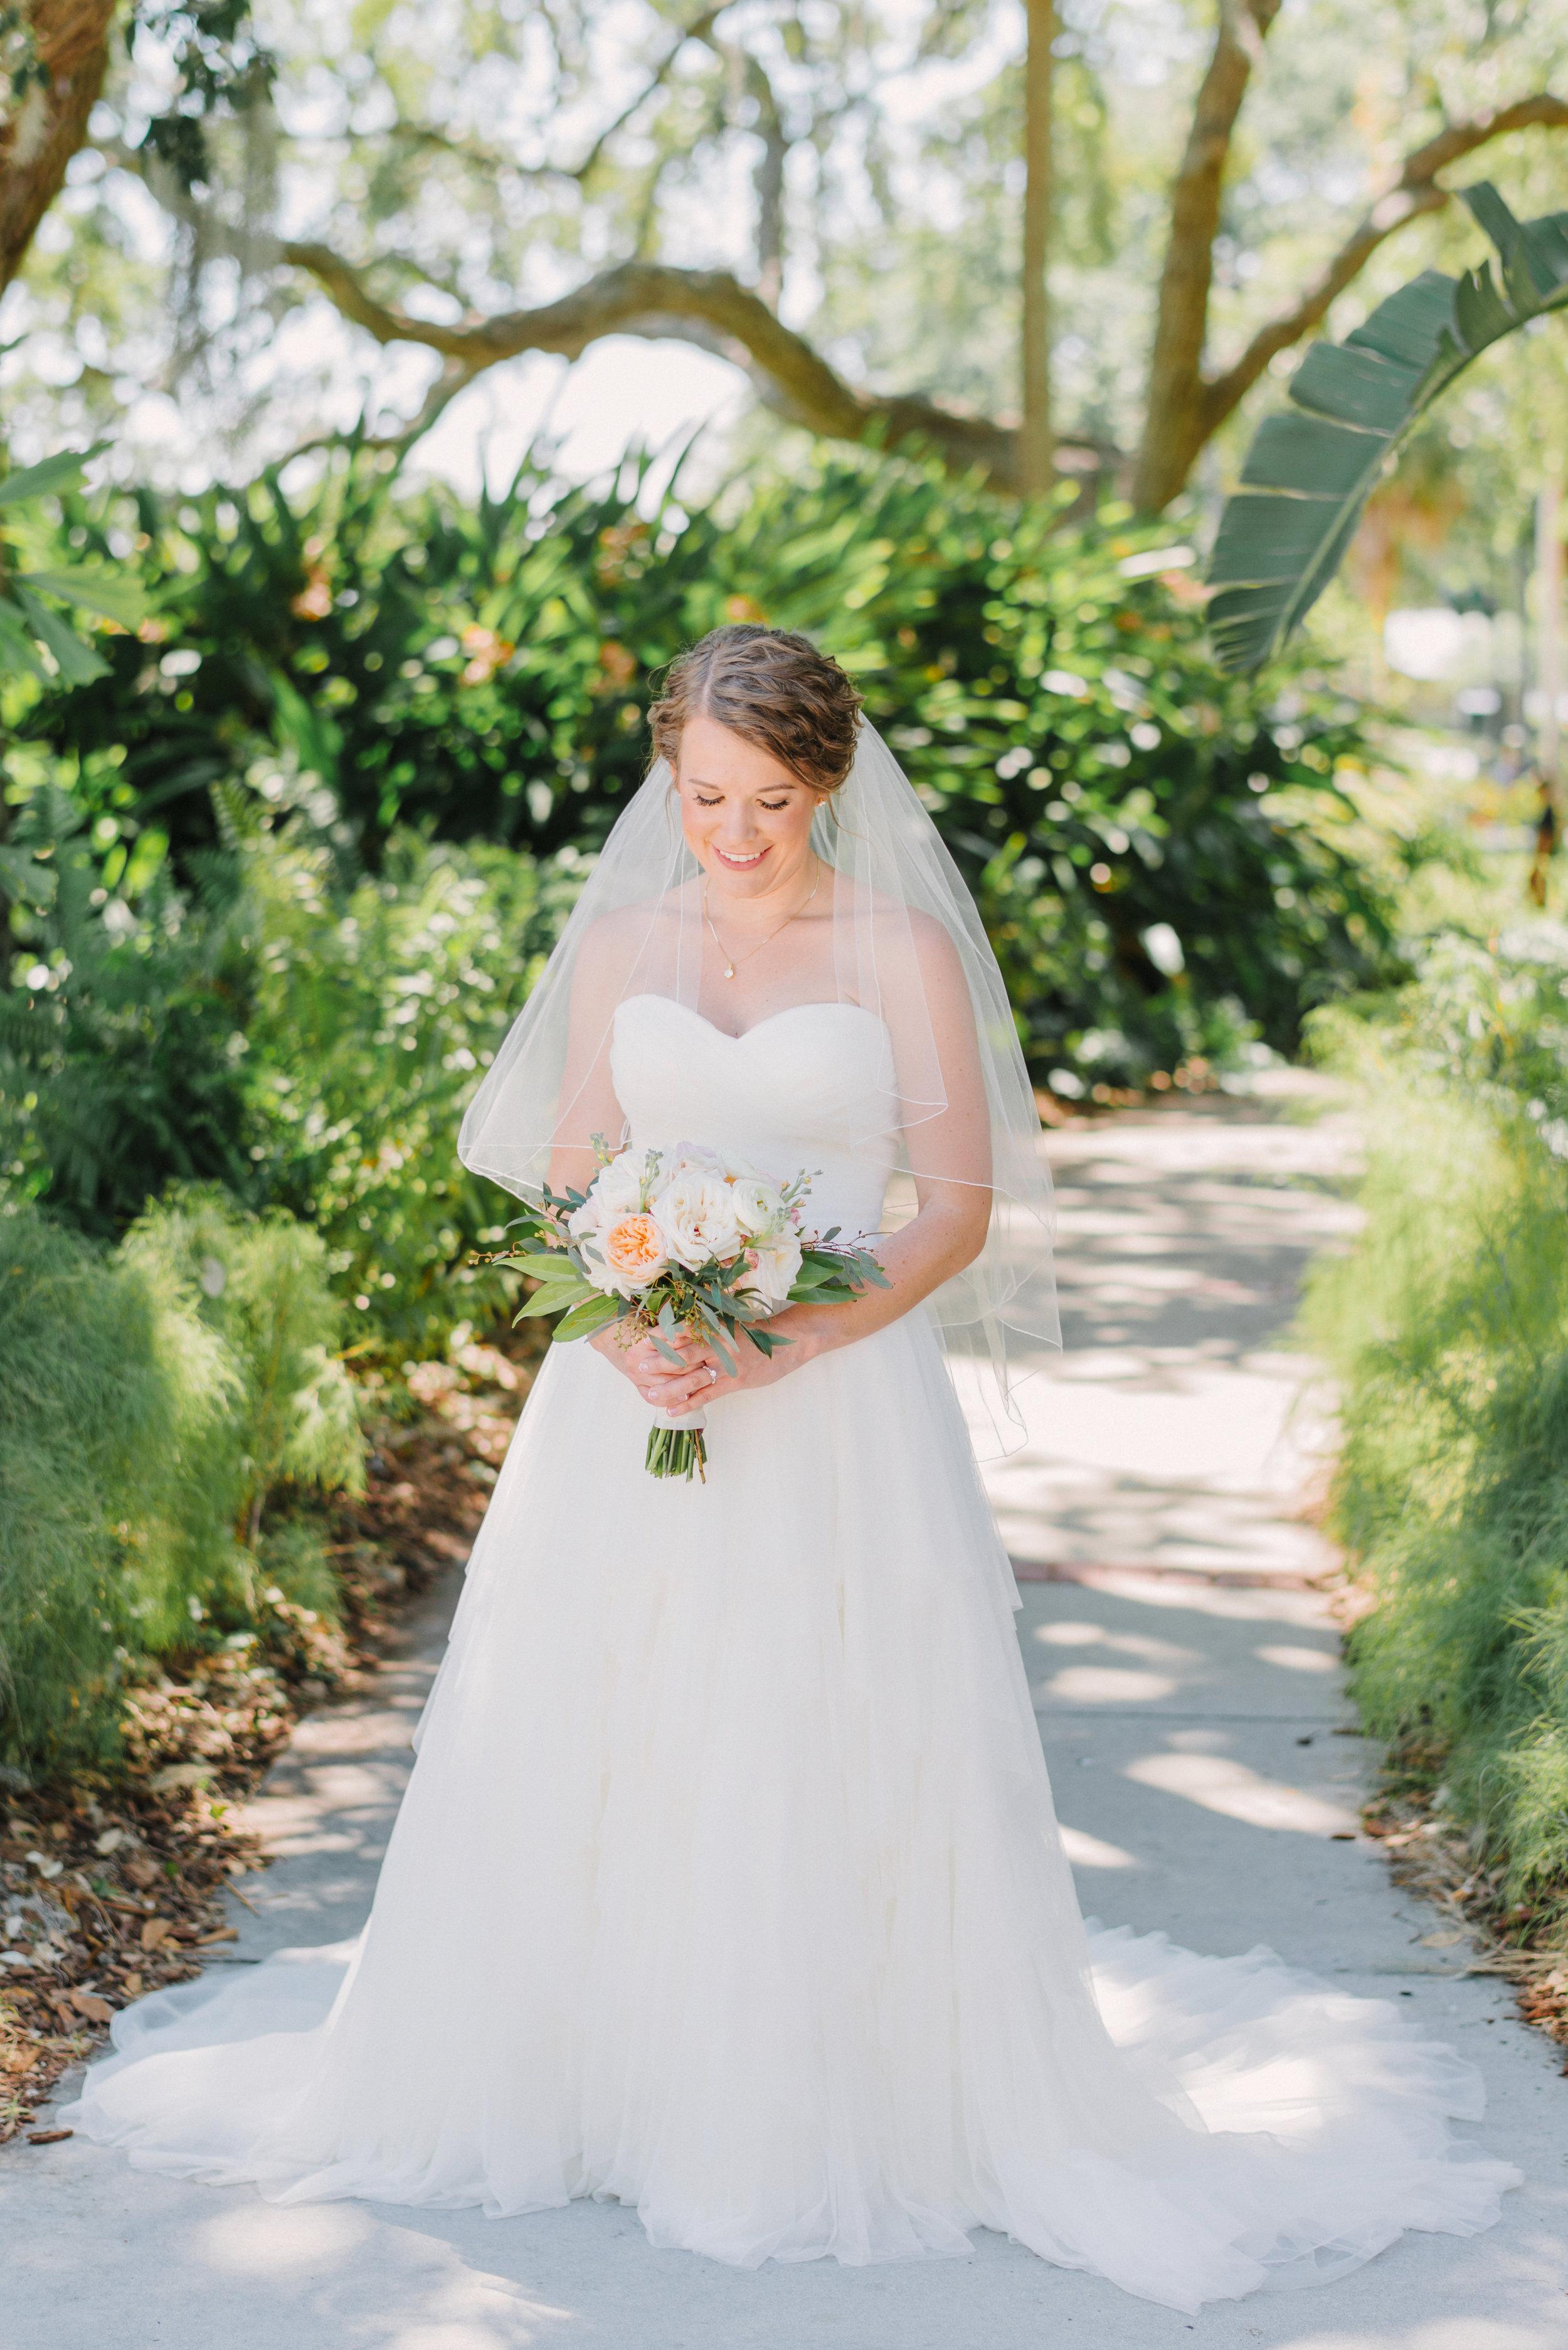 Tavares+Pavilion+on+the+Lake+Wedding+Florida_00.jpg